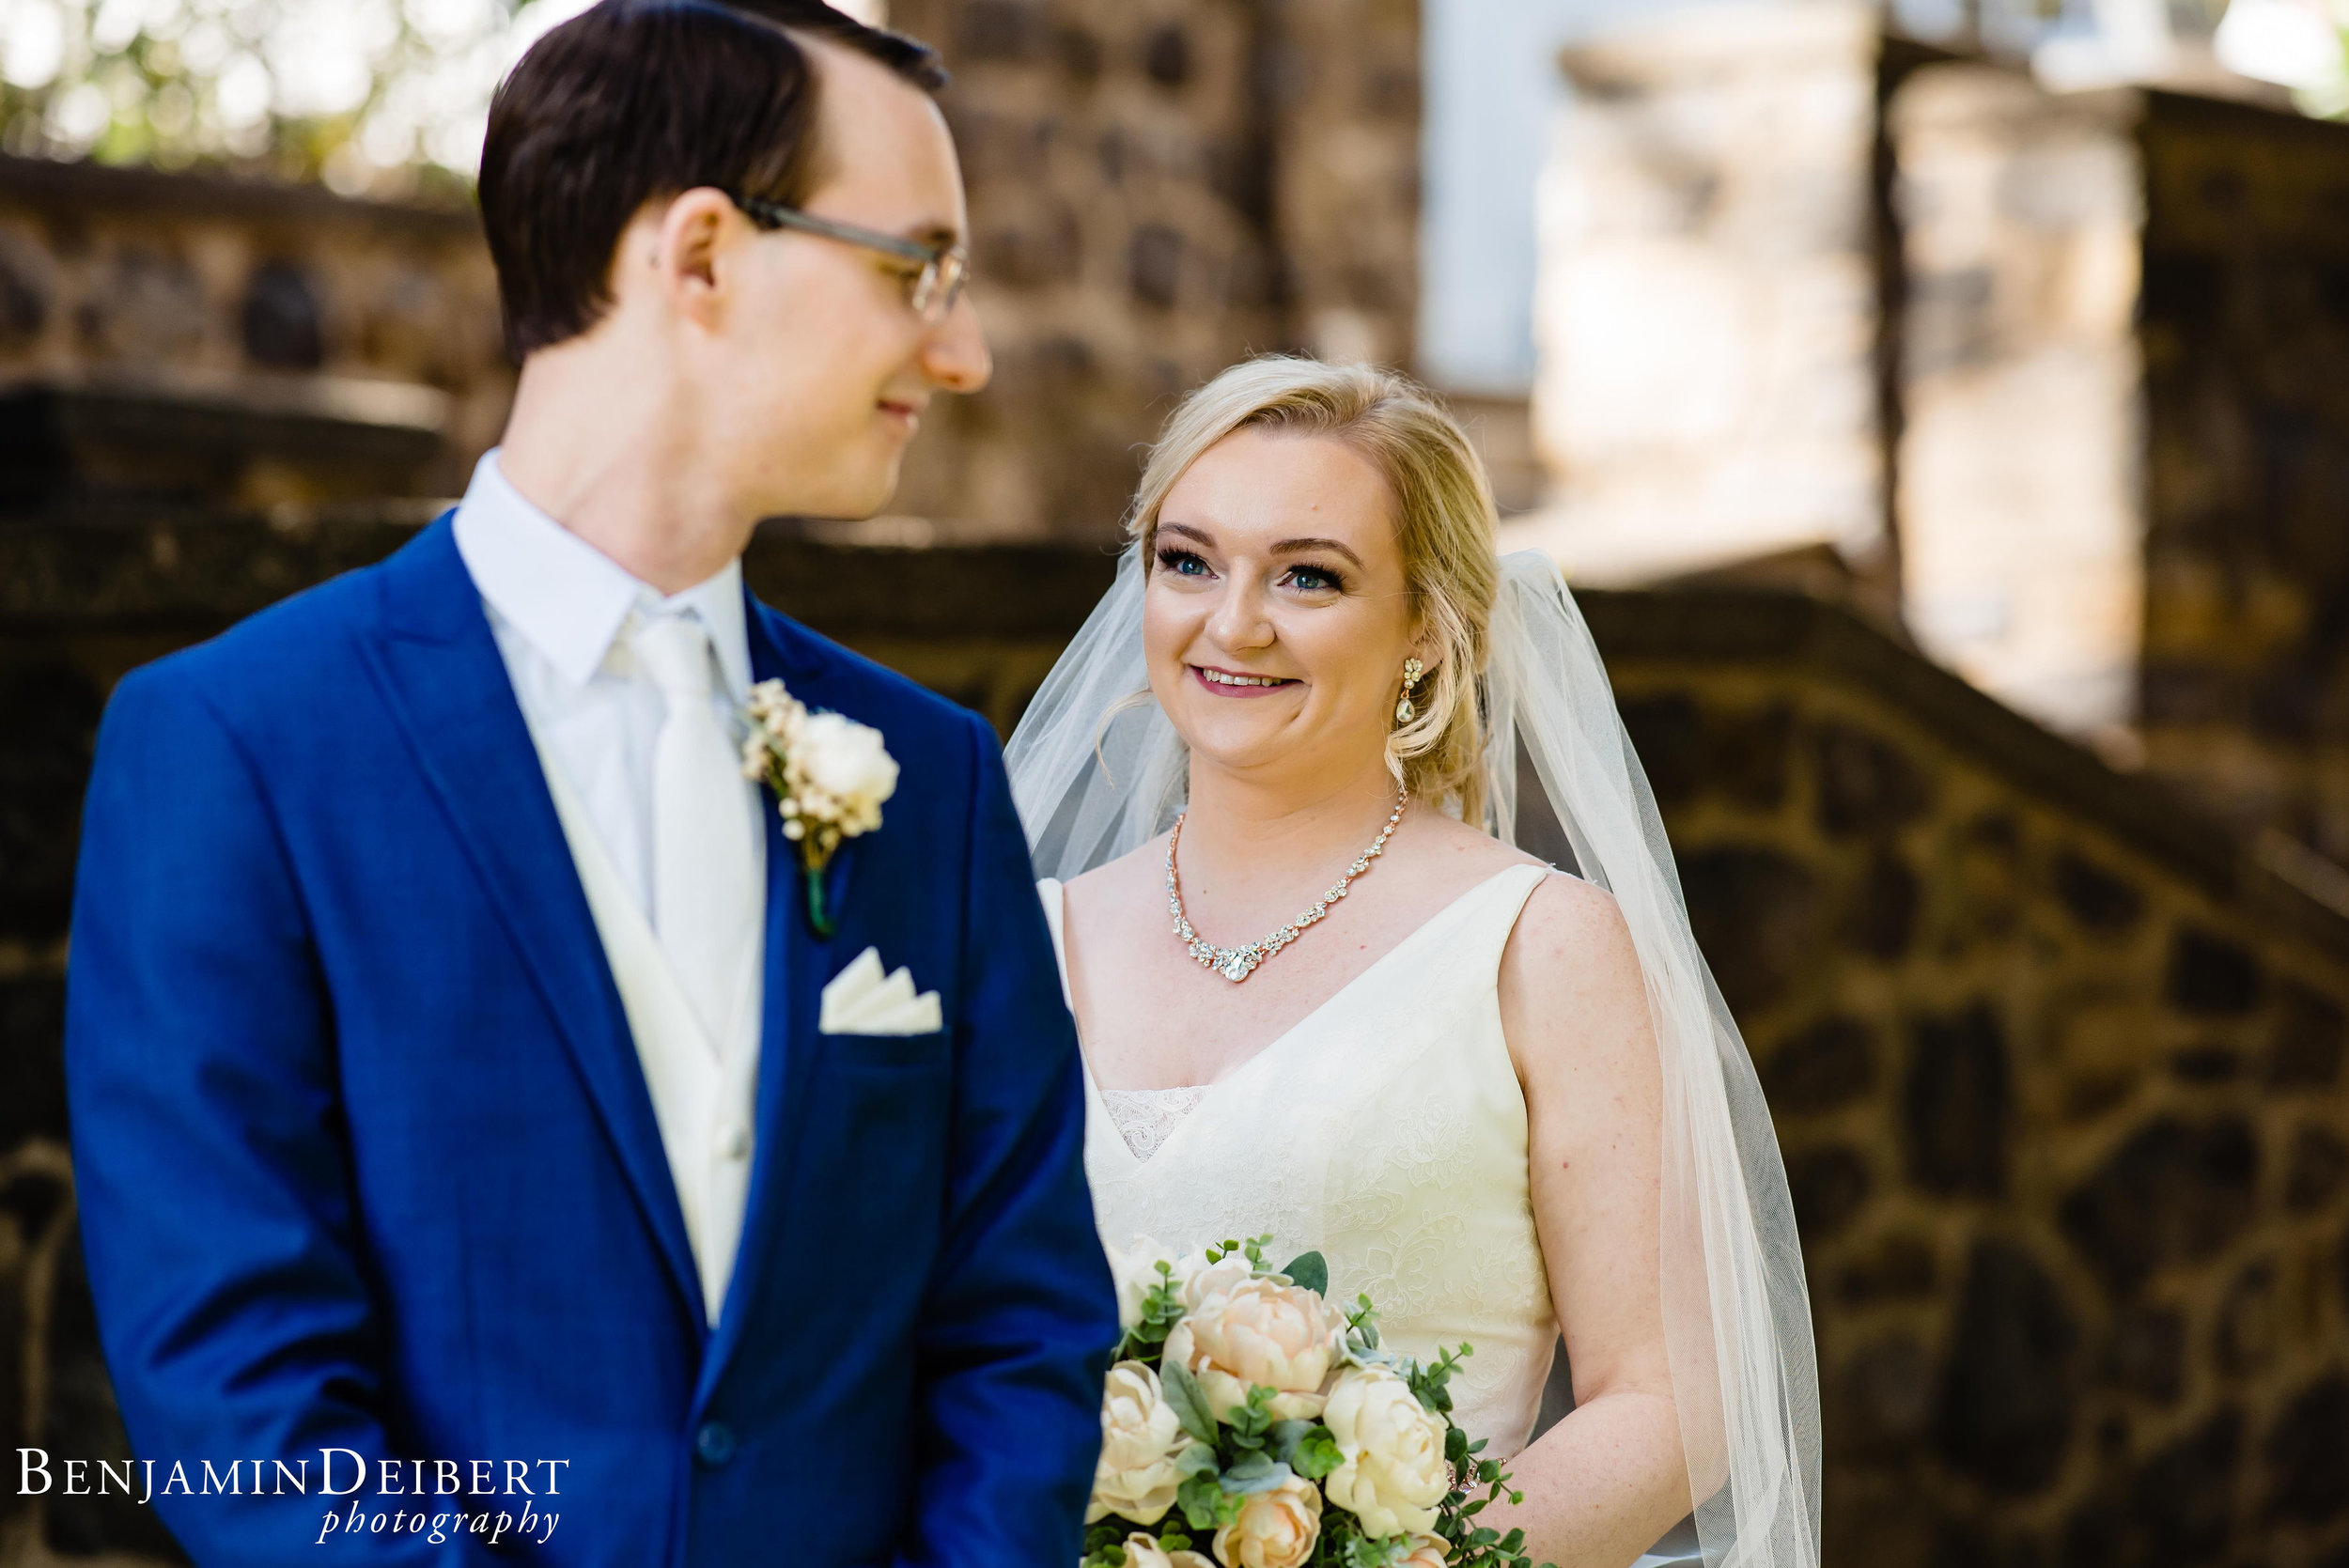 AshleyandDerrick_RadnorValleyCountryClub_Wedding-24.jpg